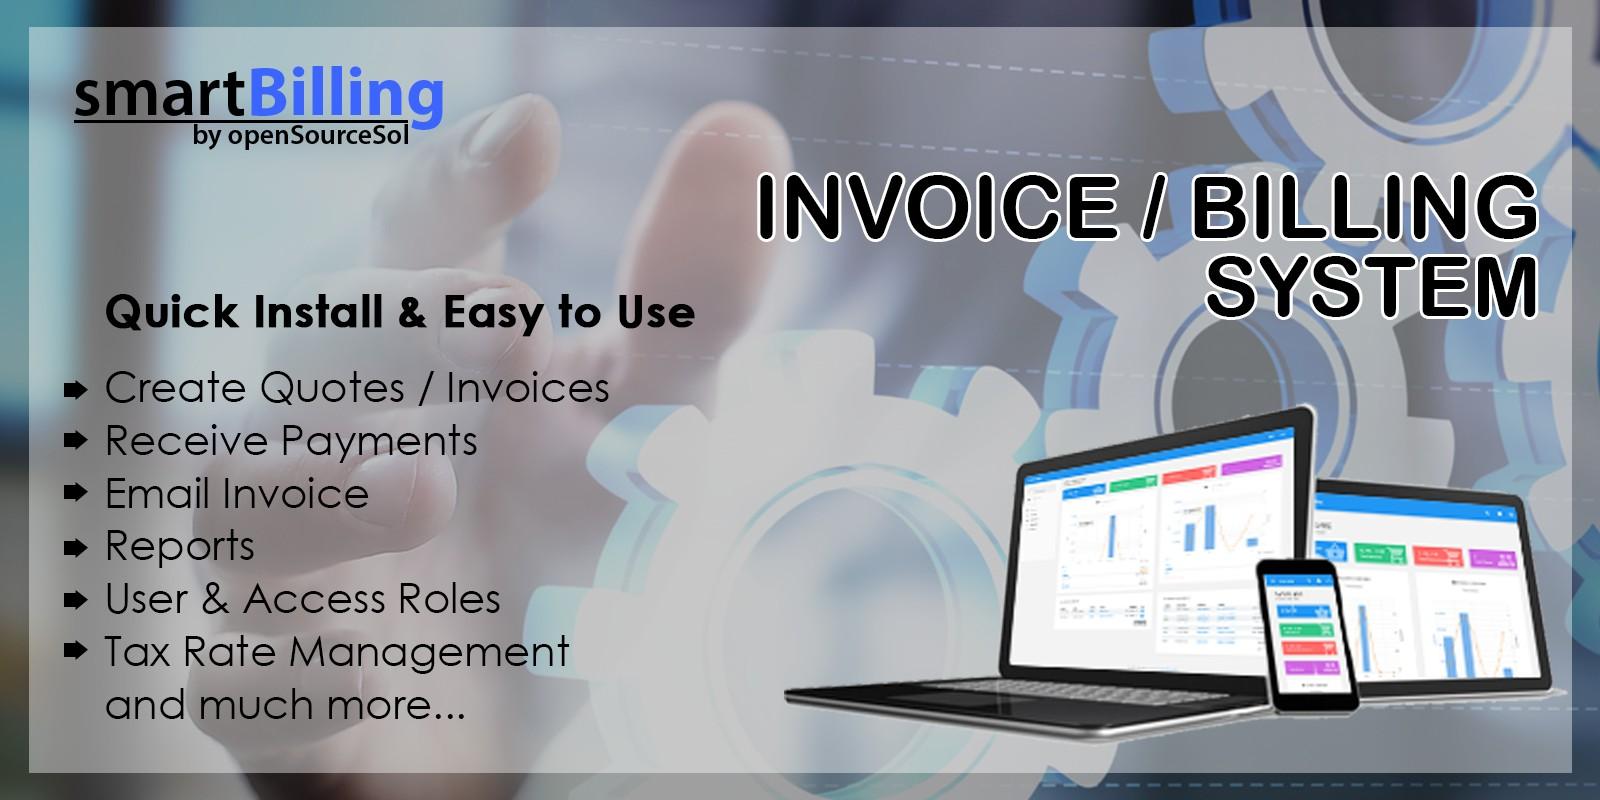 Smart Billing -  Invoicing System